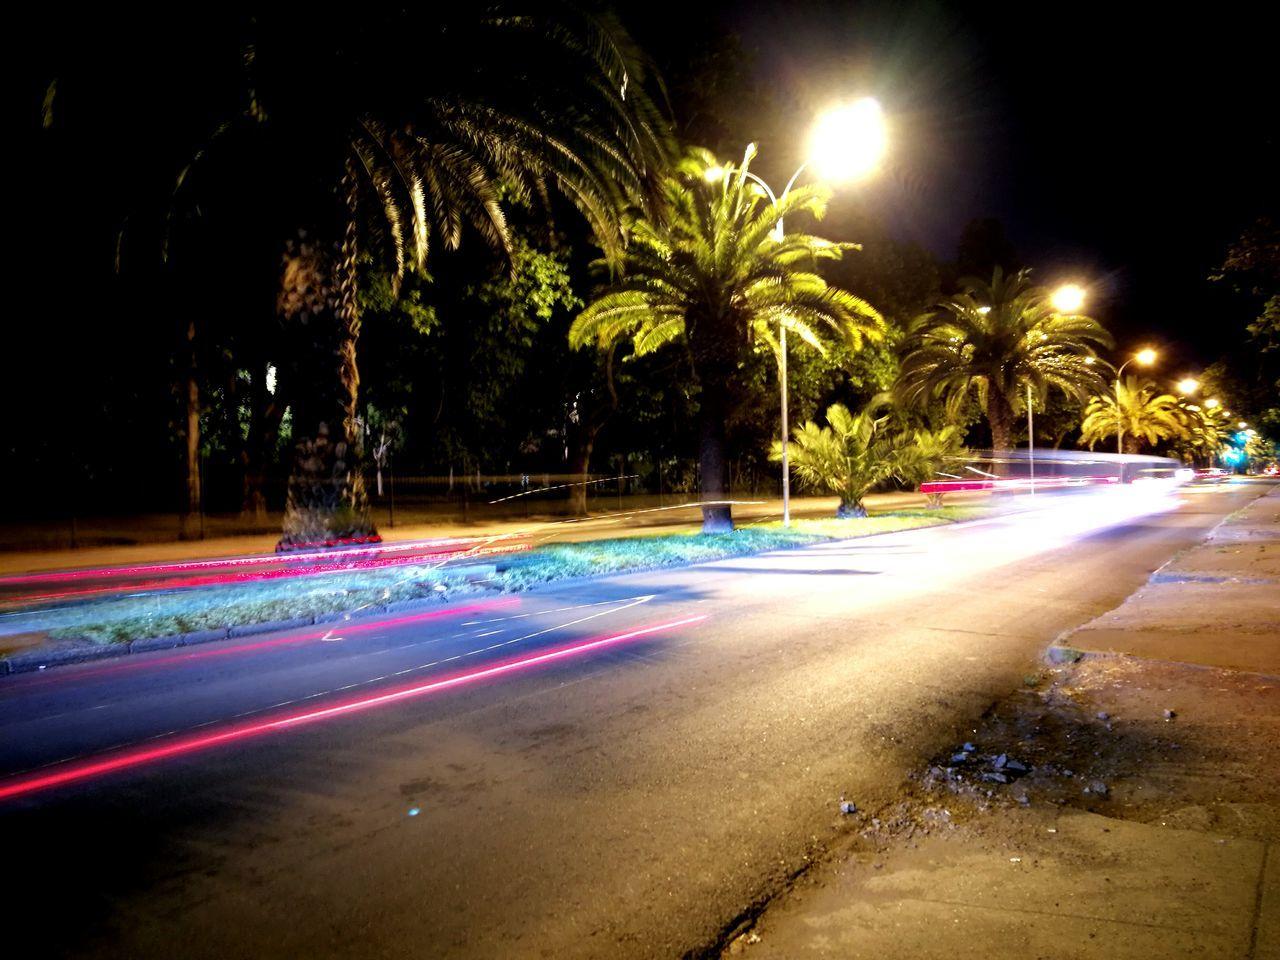 night, illuminated, long exposure, street light, street, light trail, road, motion, outdoors, speed, no people, tree, palm tree, water, sky, nature, city